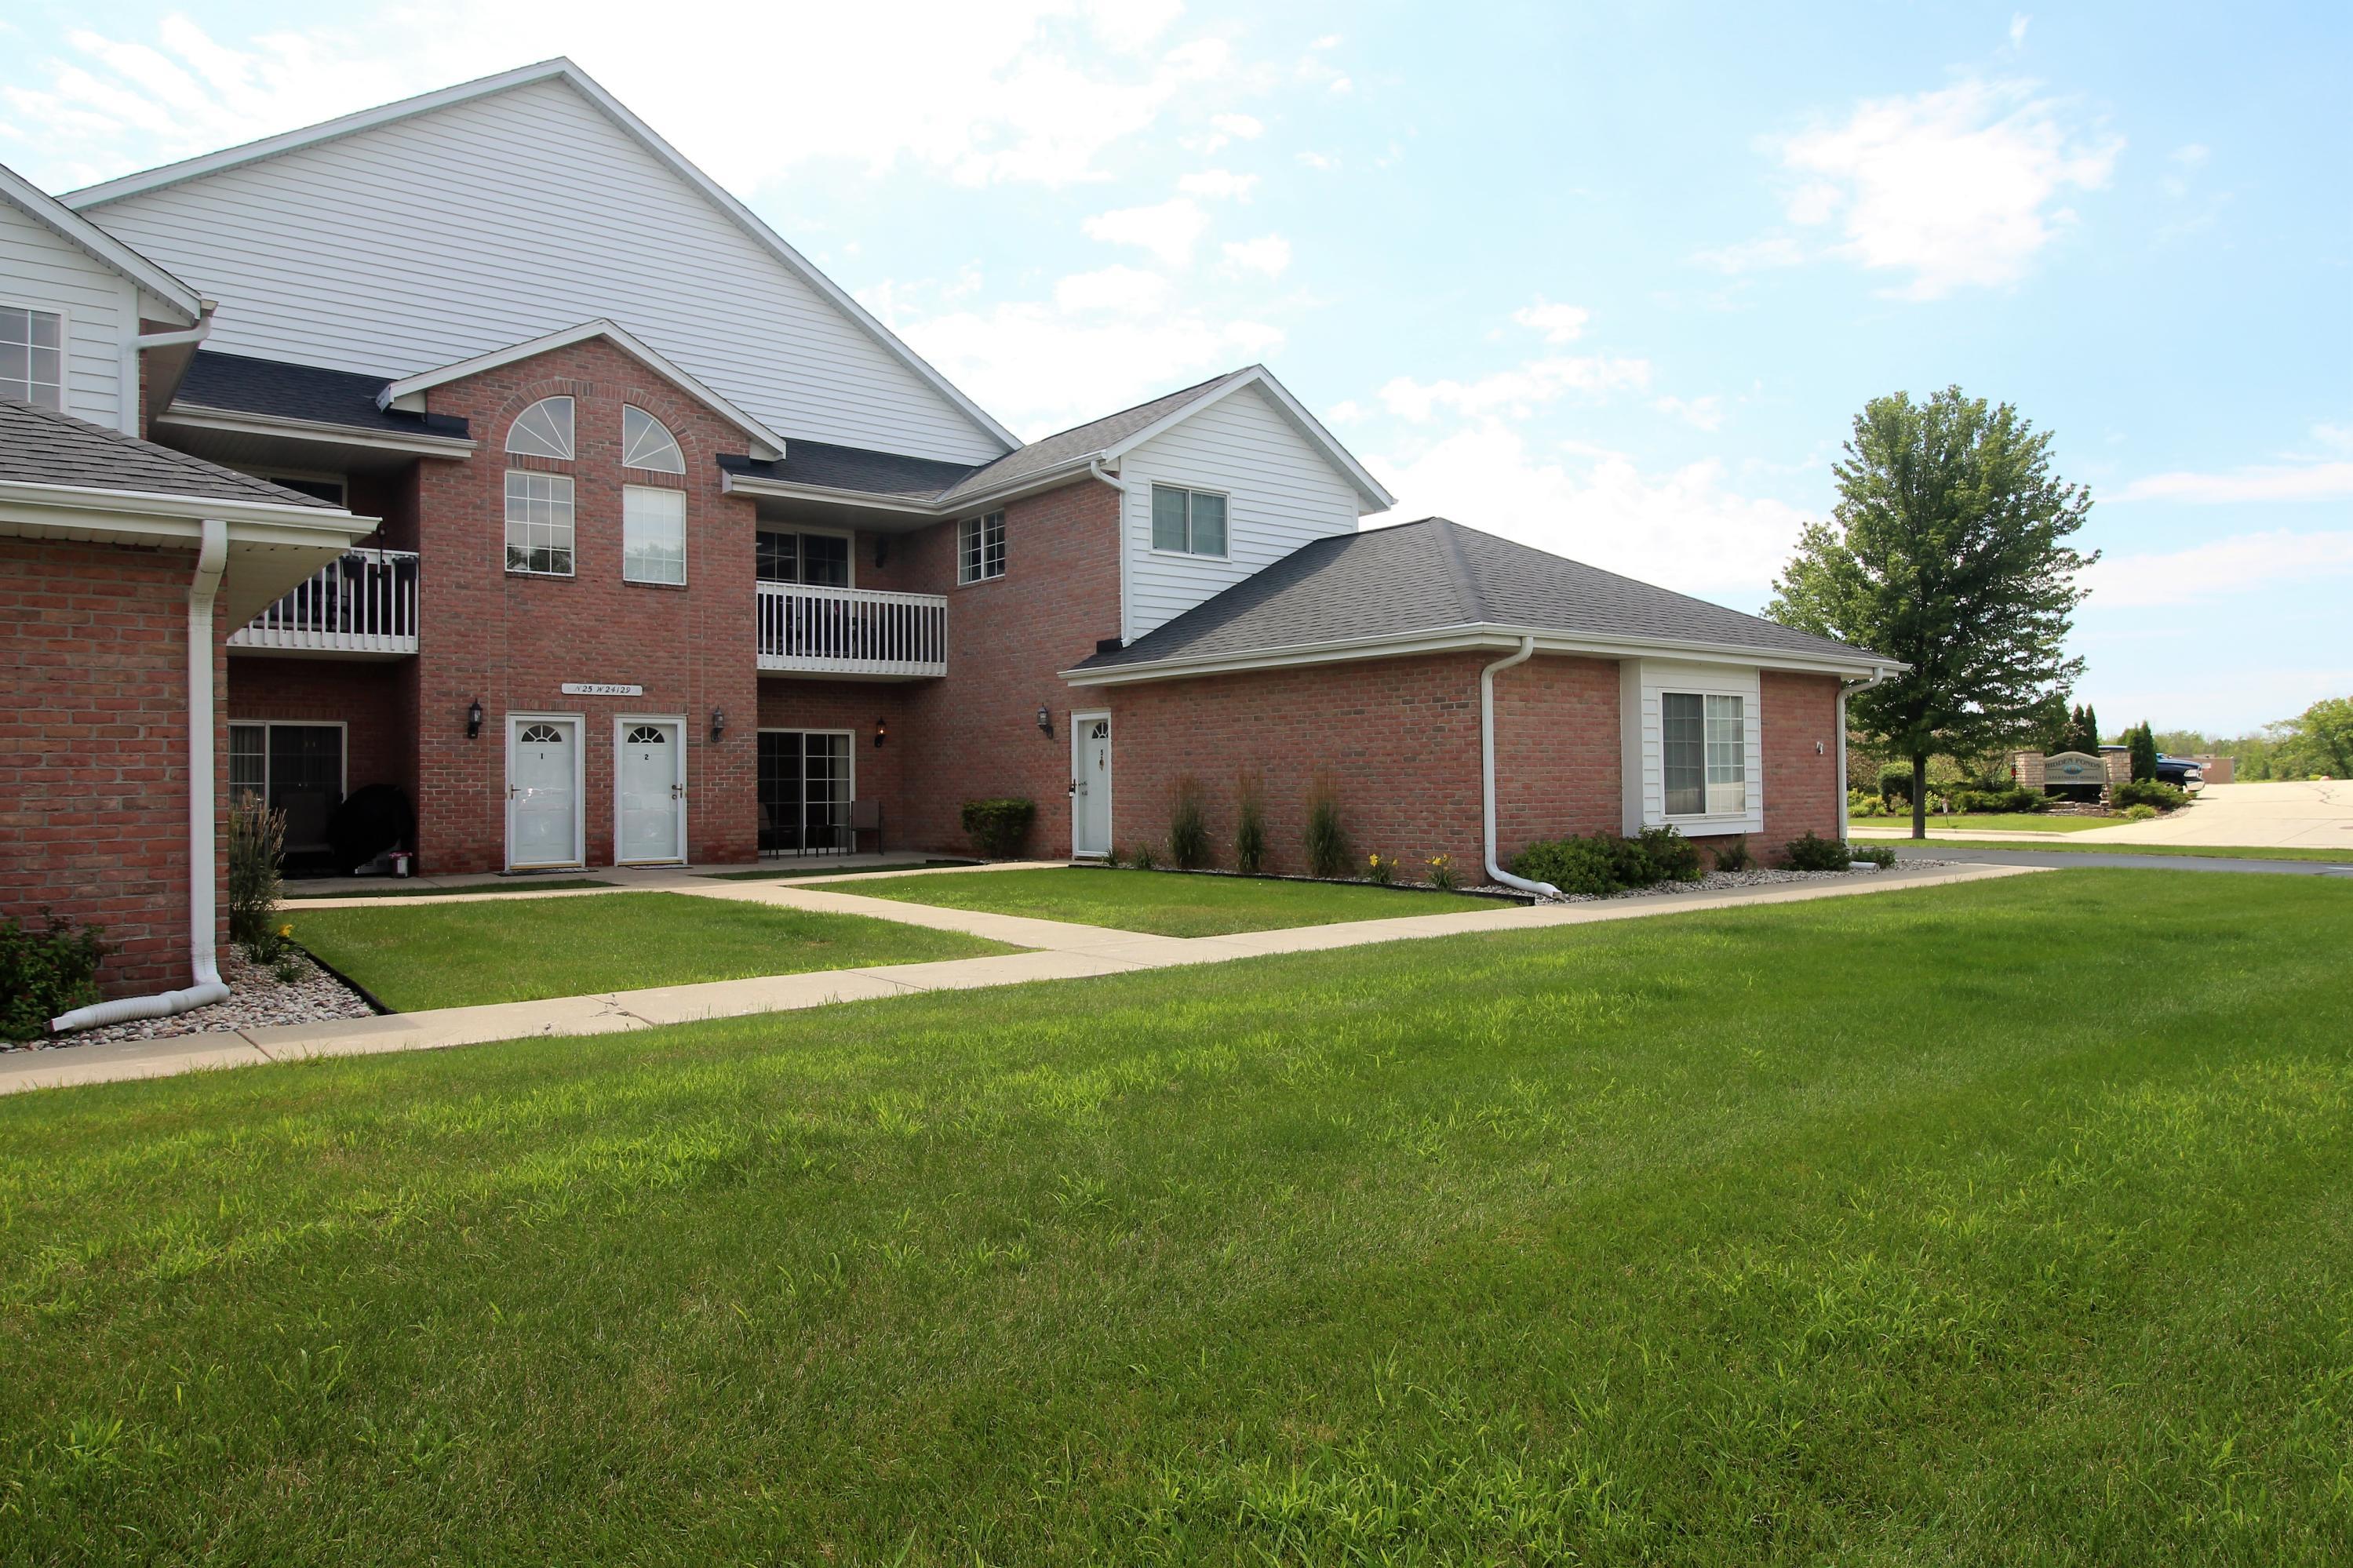 N25W24129 River Park Dr, Pewaukee, Wisconsin 53072, 2 Bedrooms Bedrooms, 5 Rooms Rooms,2 BathroomsBathrooms,Condominiums,For Sale,River Park Dr,1,1701290